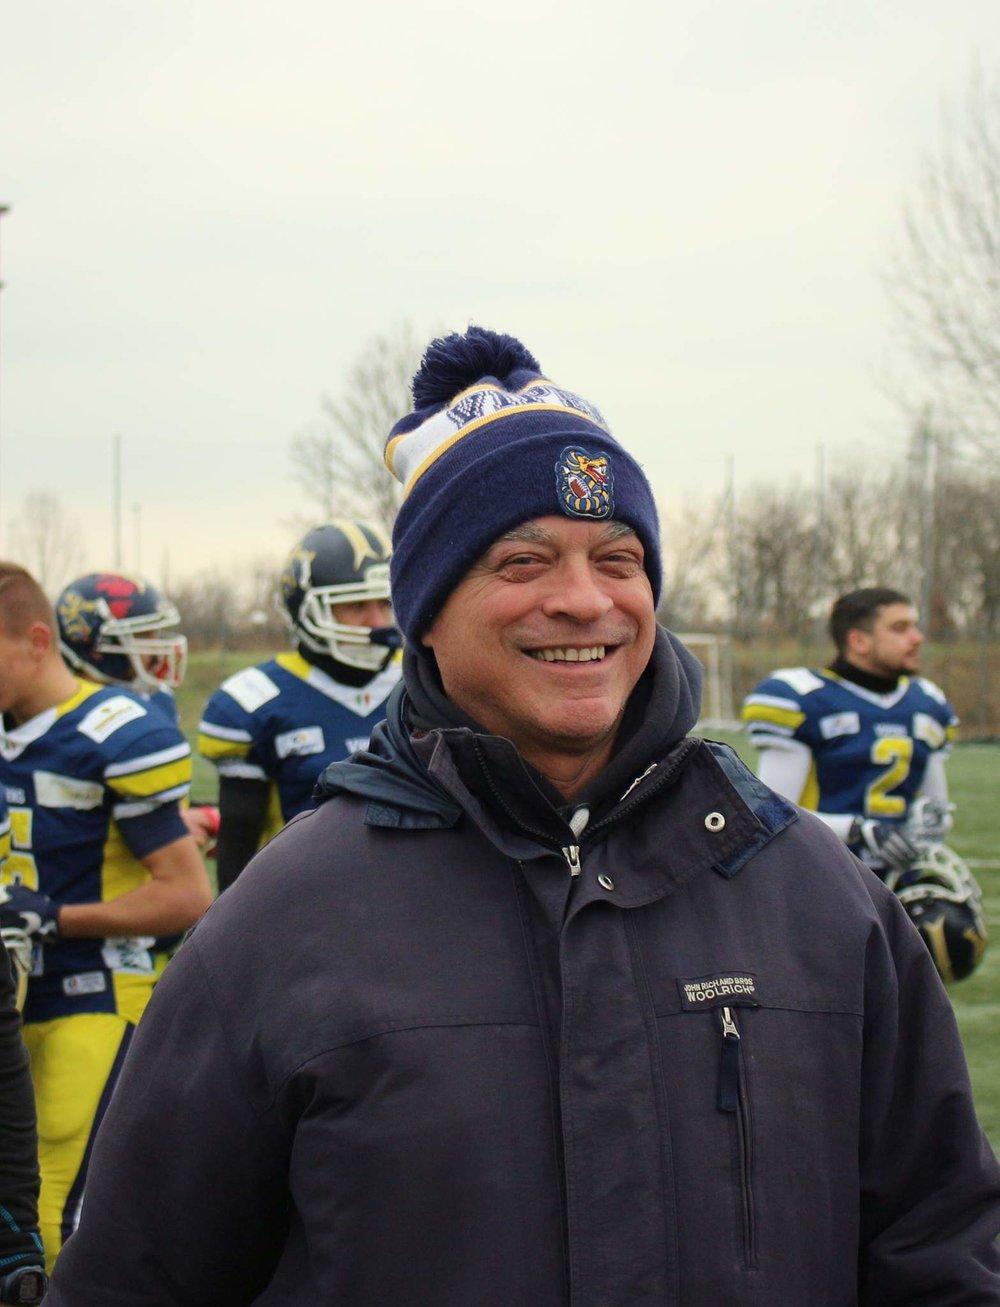 HC Tony Mangifico